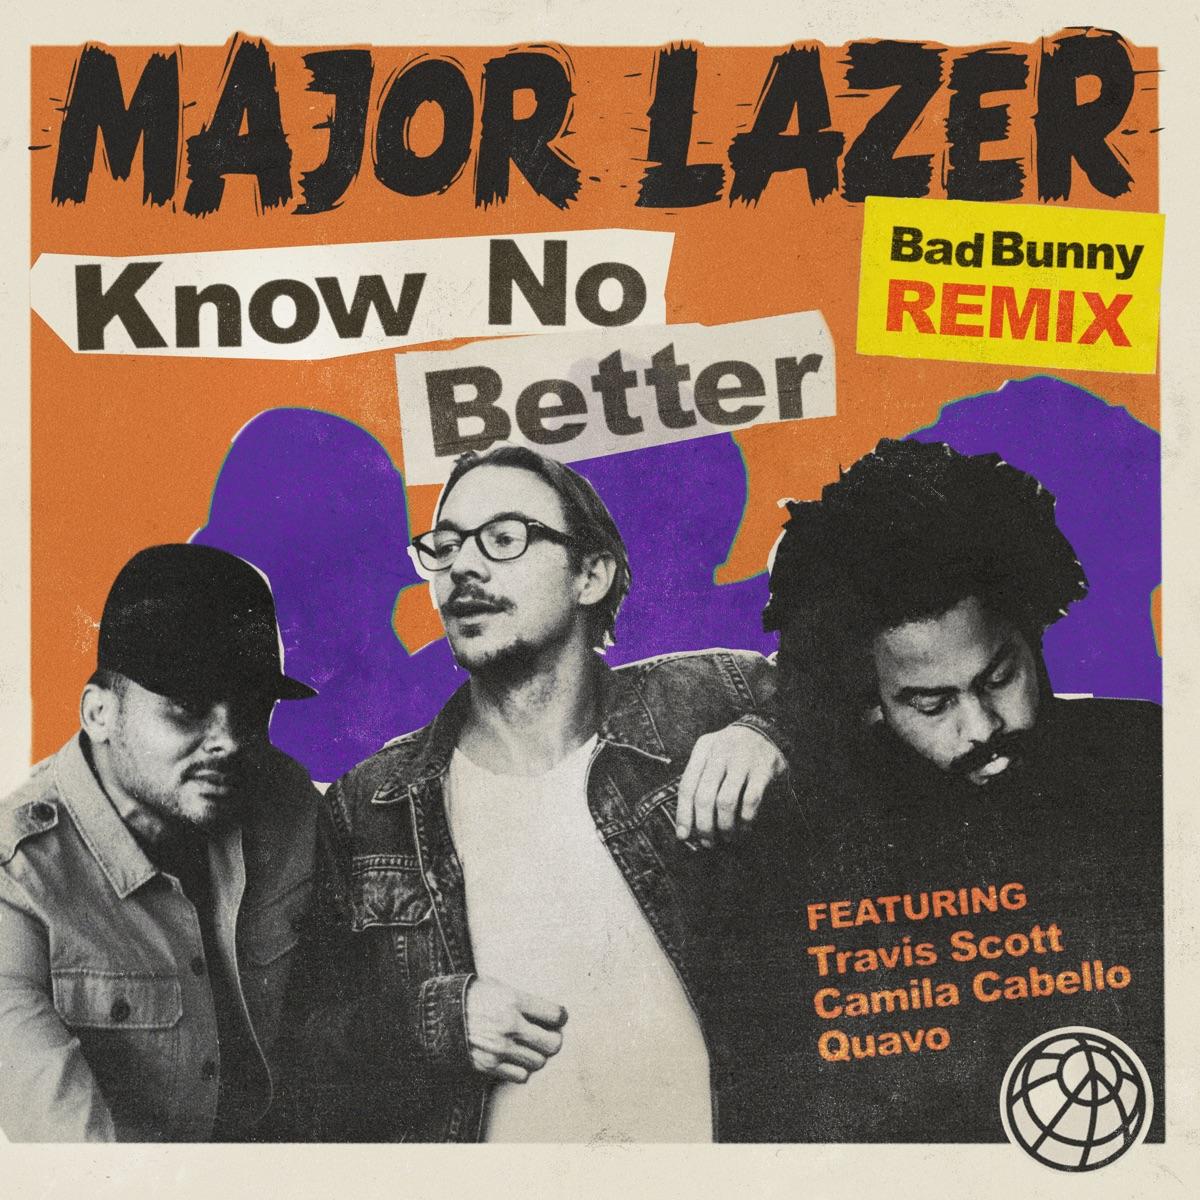 Know No Better feat Travis Scott Camila Cabello  Quavo Bad Bunny Remix - Single Major Lazer CD cover